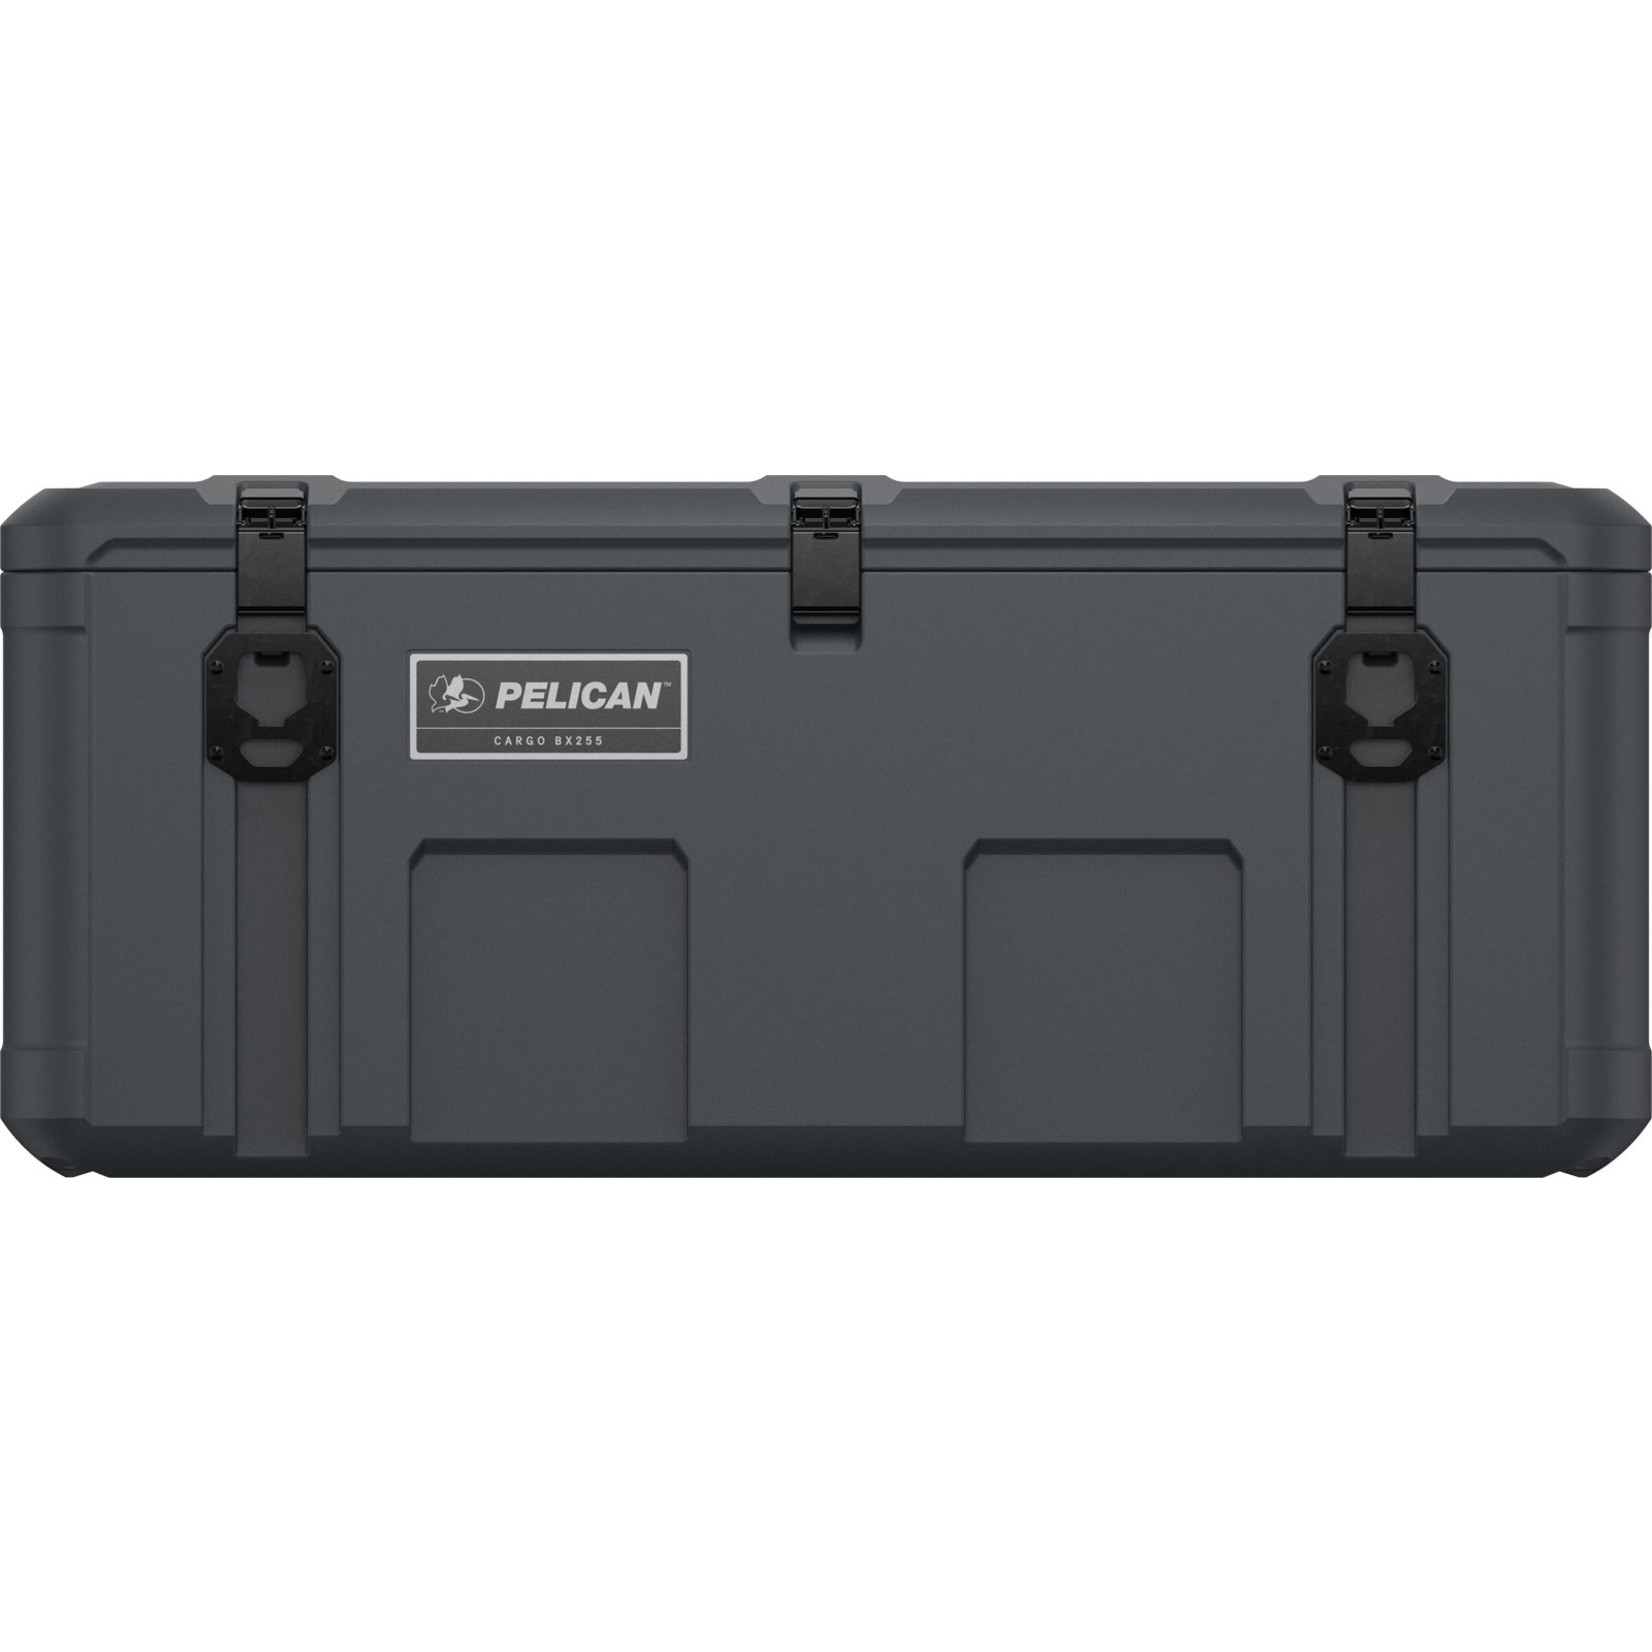 Pelican BX255 Cargo Case Black